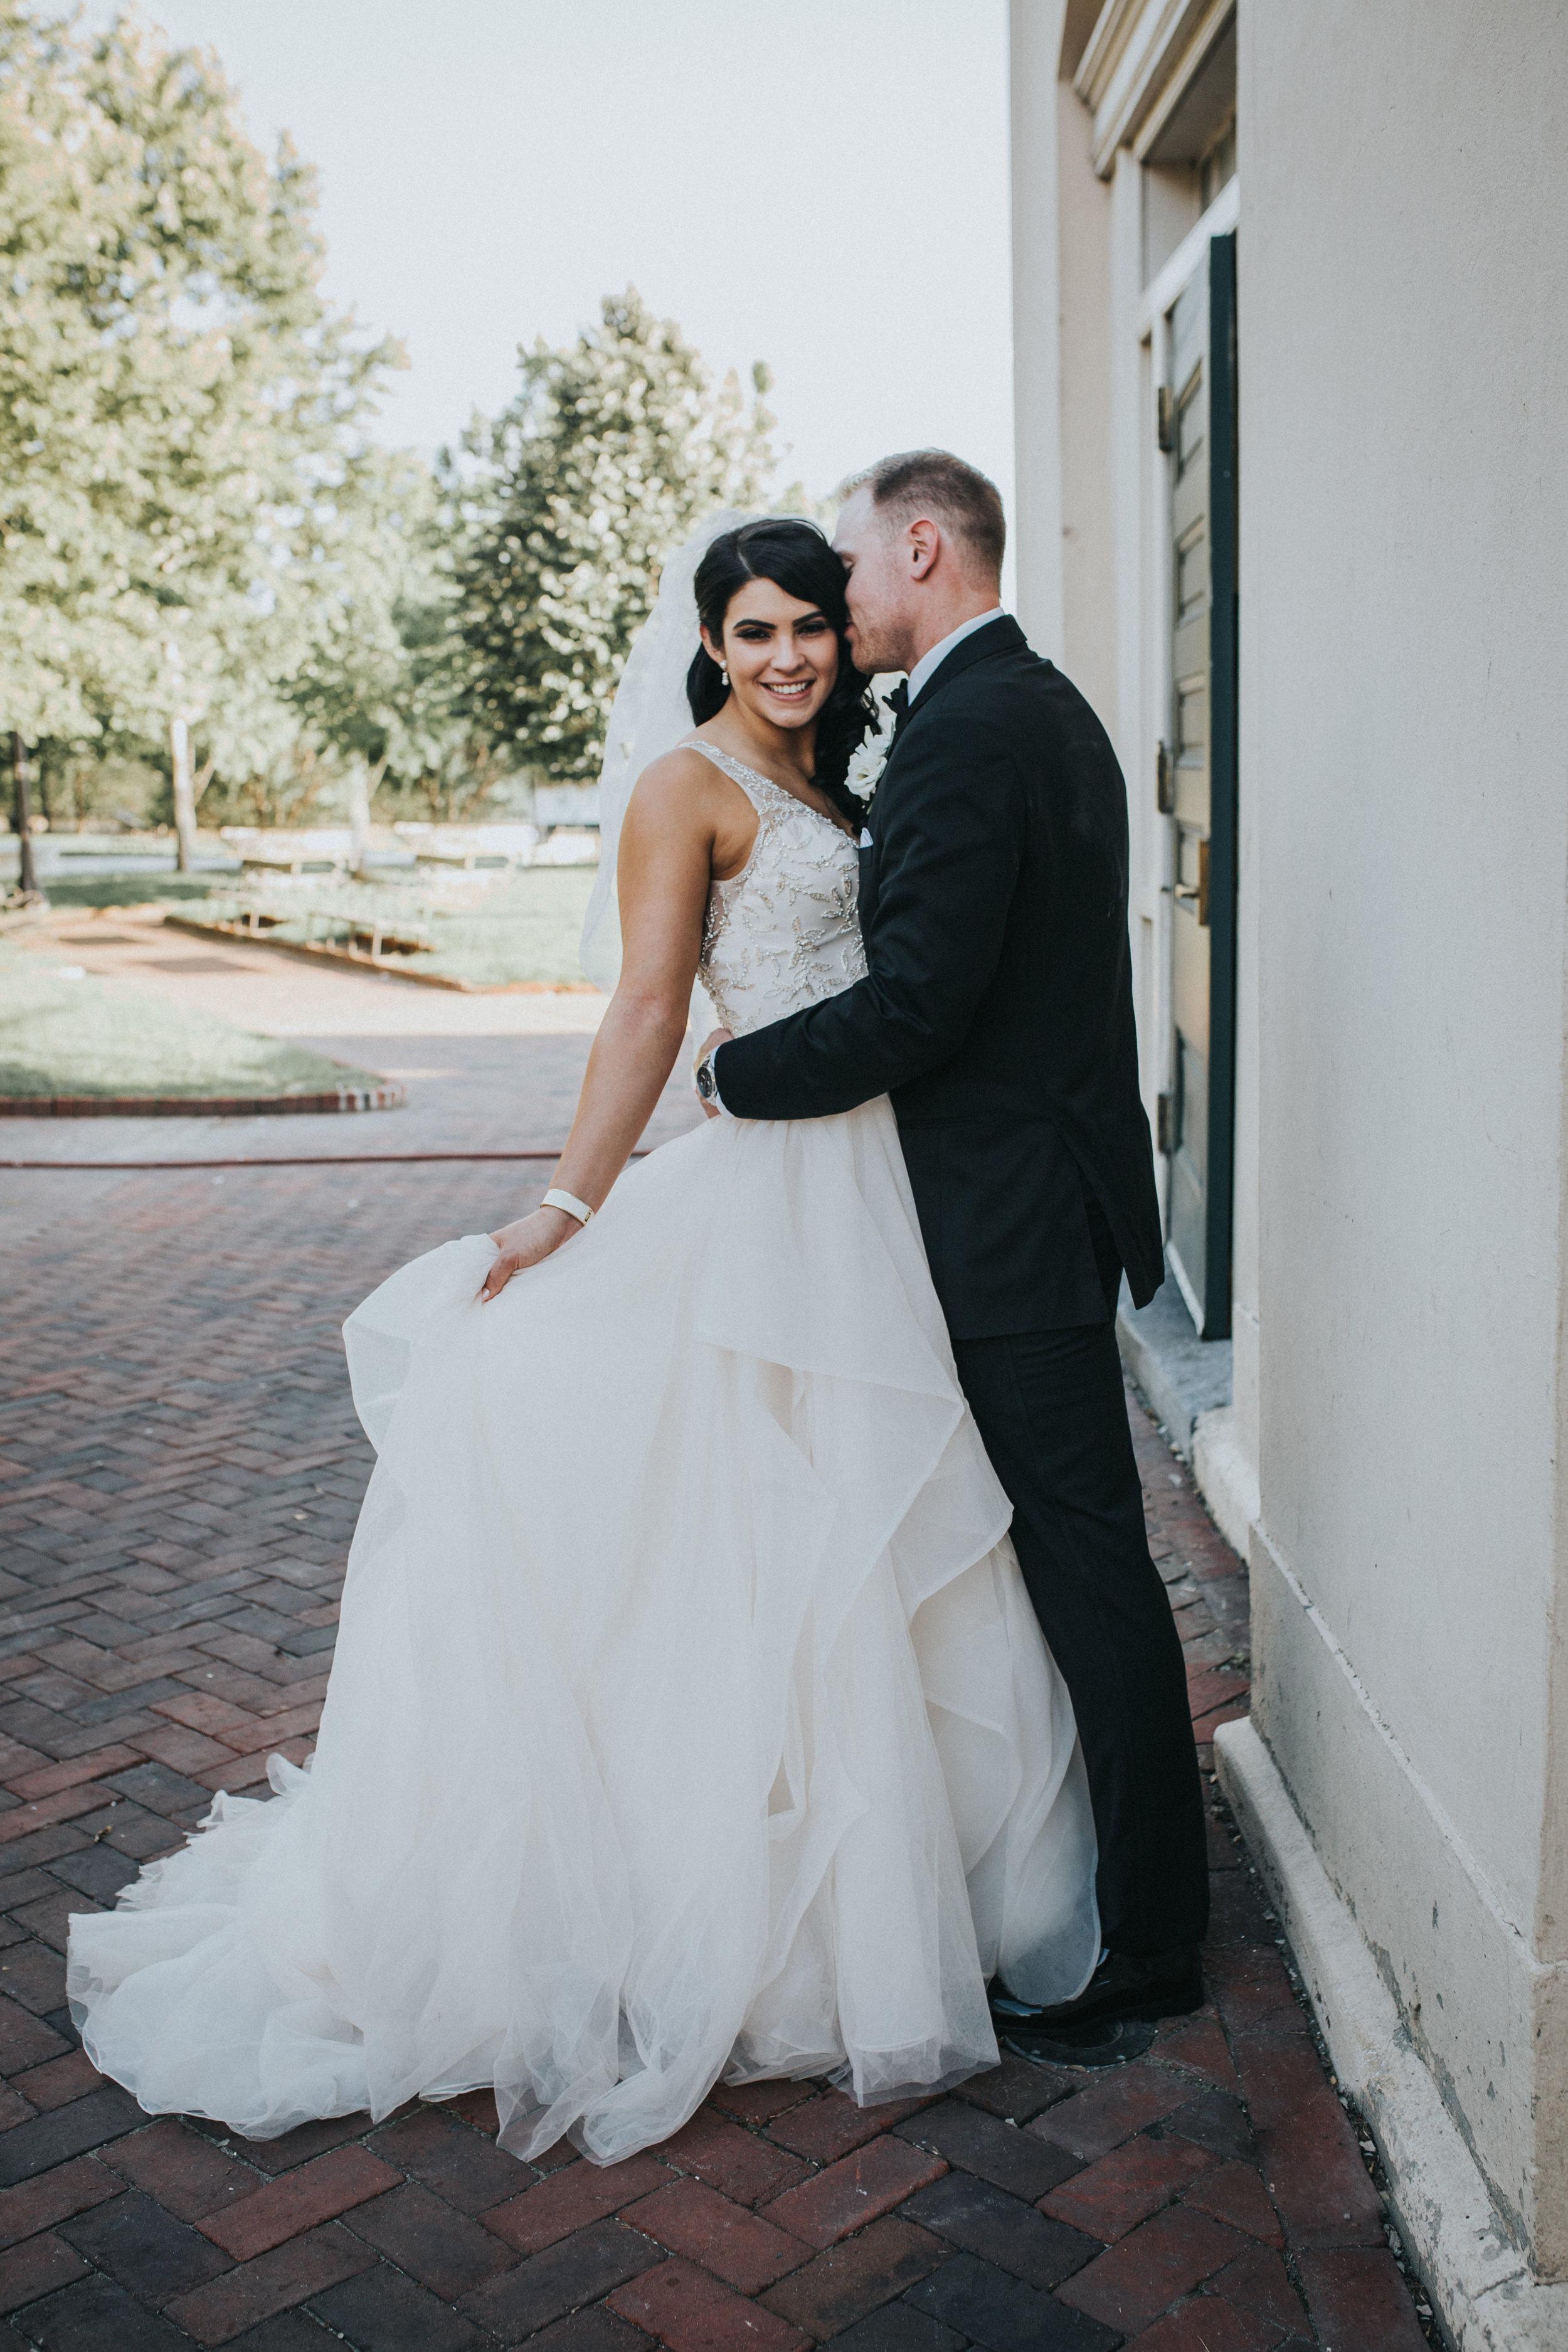 NewJersey_Wedding_Photography_Philadelphia__cescaphe_Waterworks_Bride&Groom-28.jpg